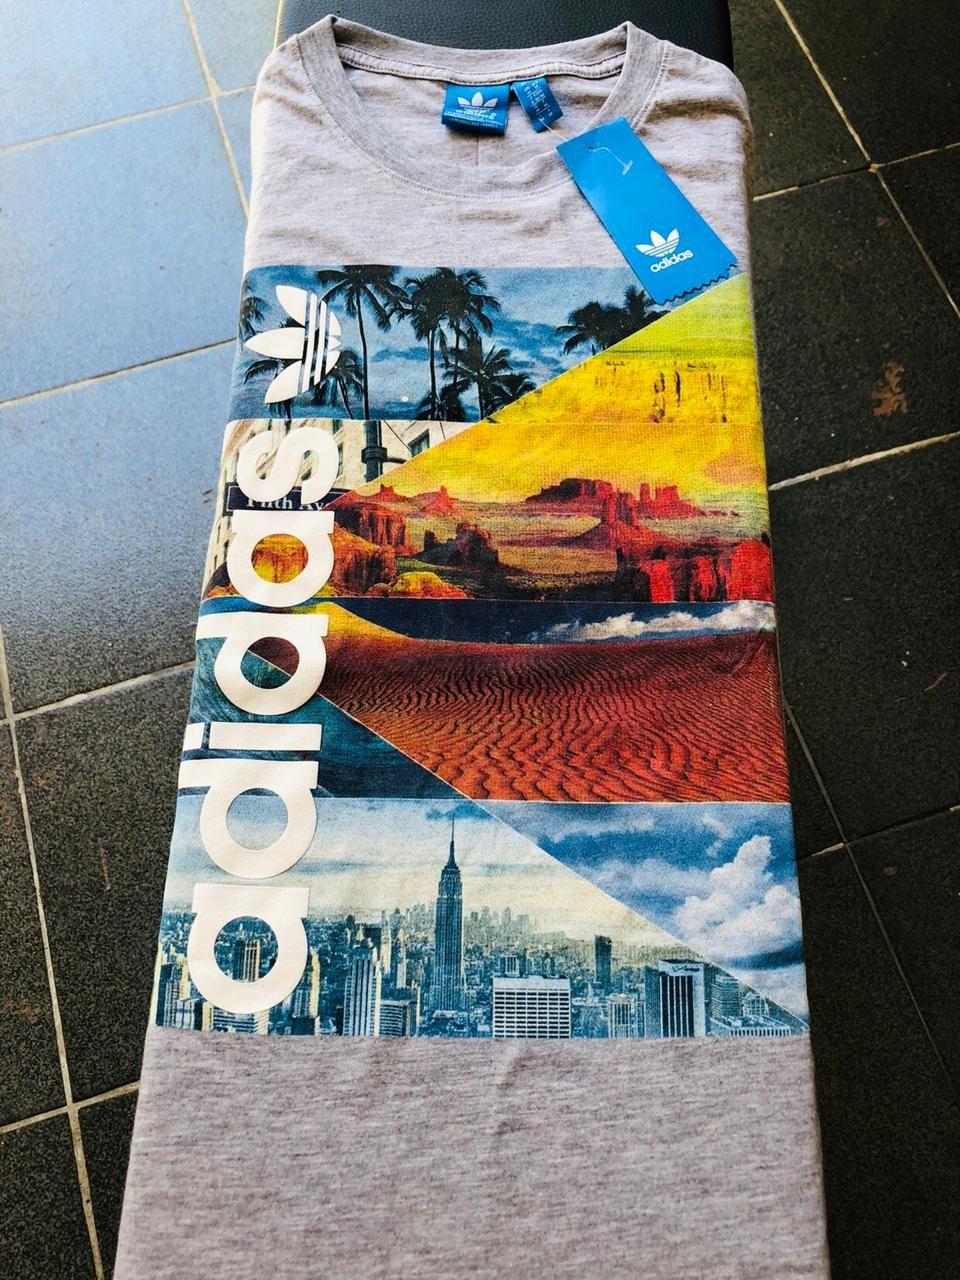 Camiseta Adidas | Roupas, Roupas importadas, Estampas